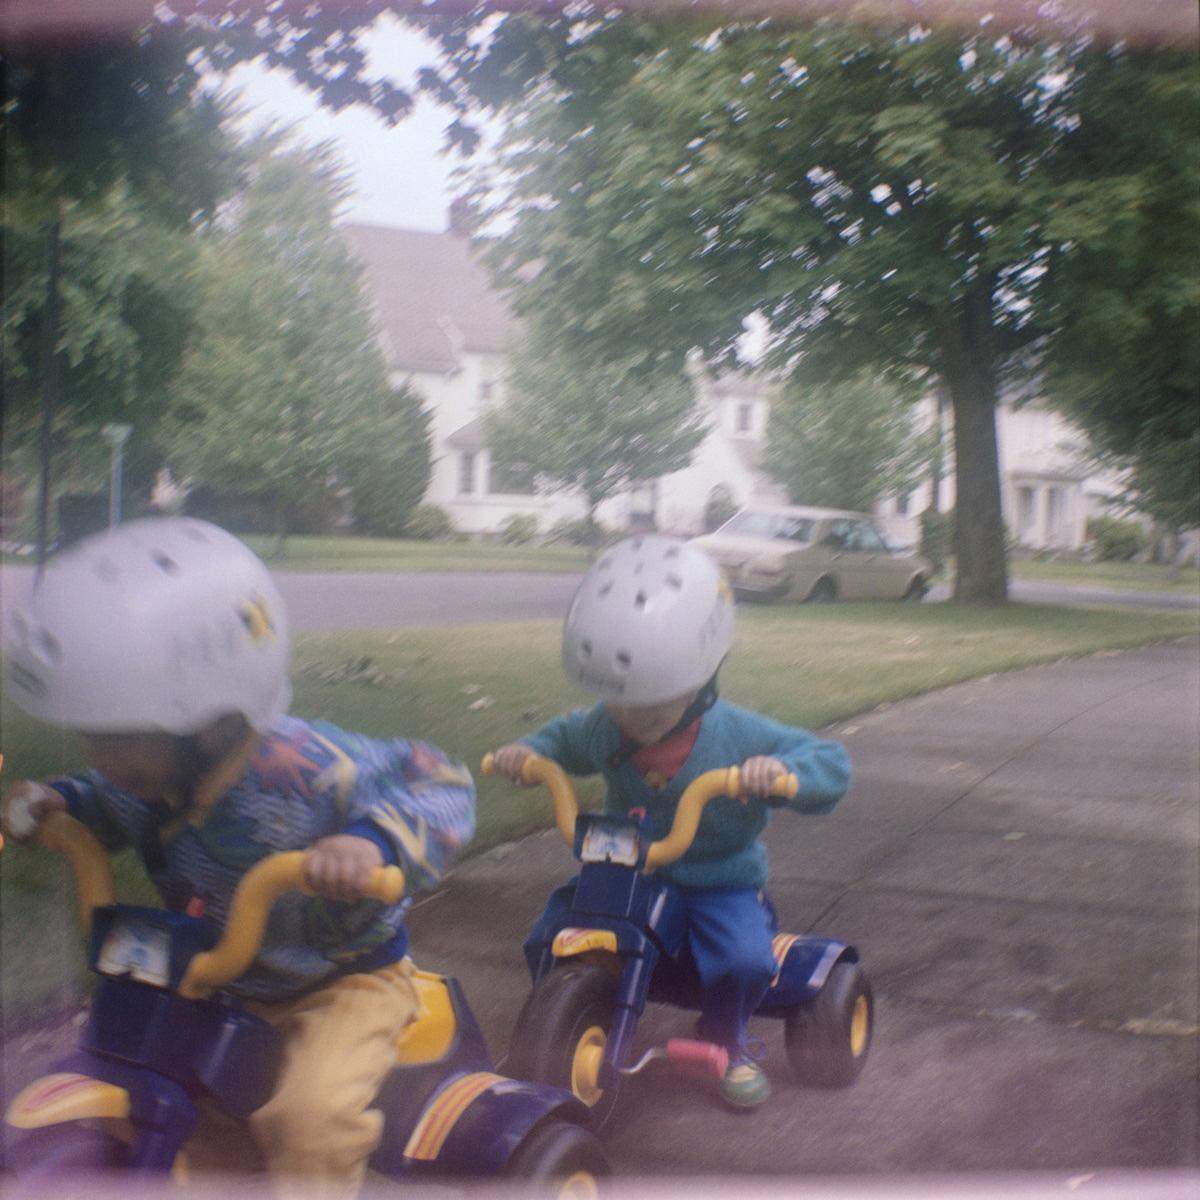 Ben and Daniel on Their Trikes